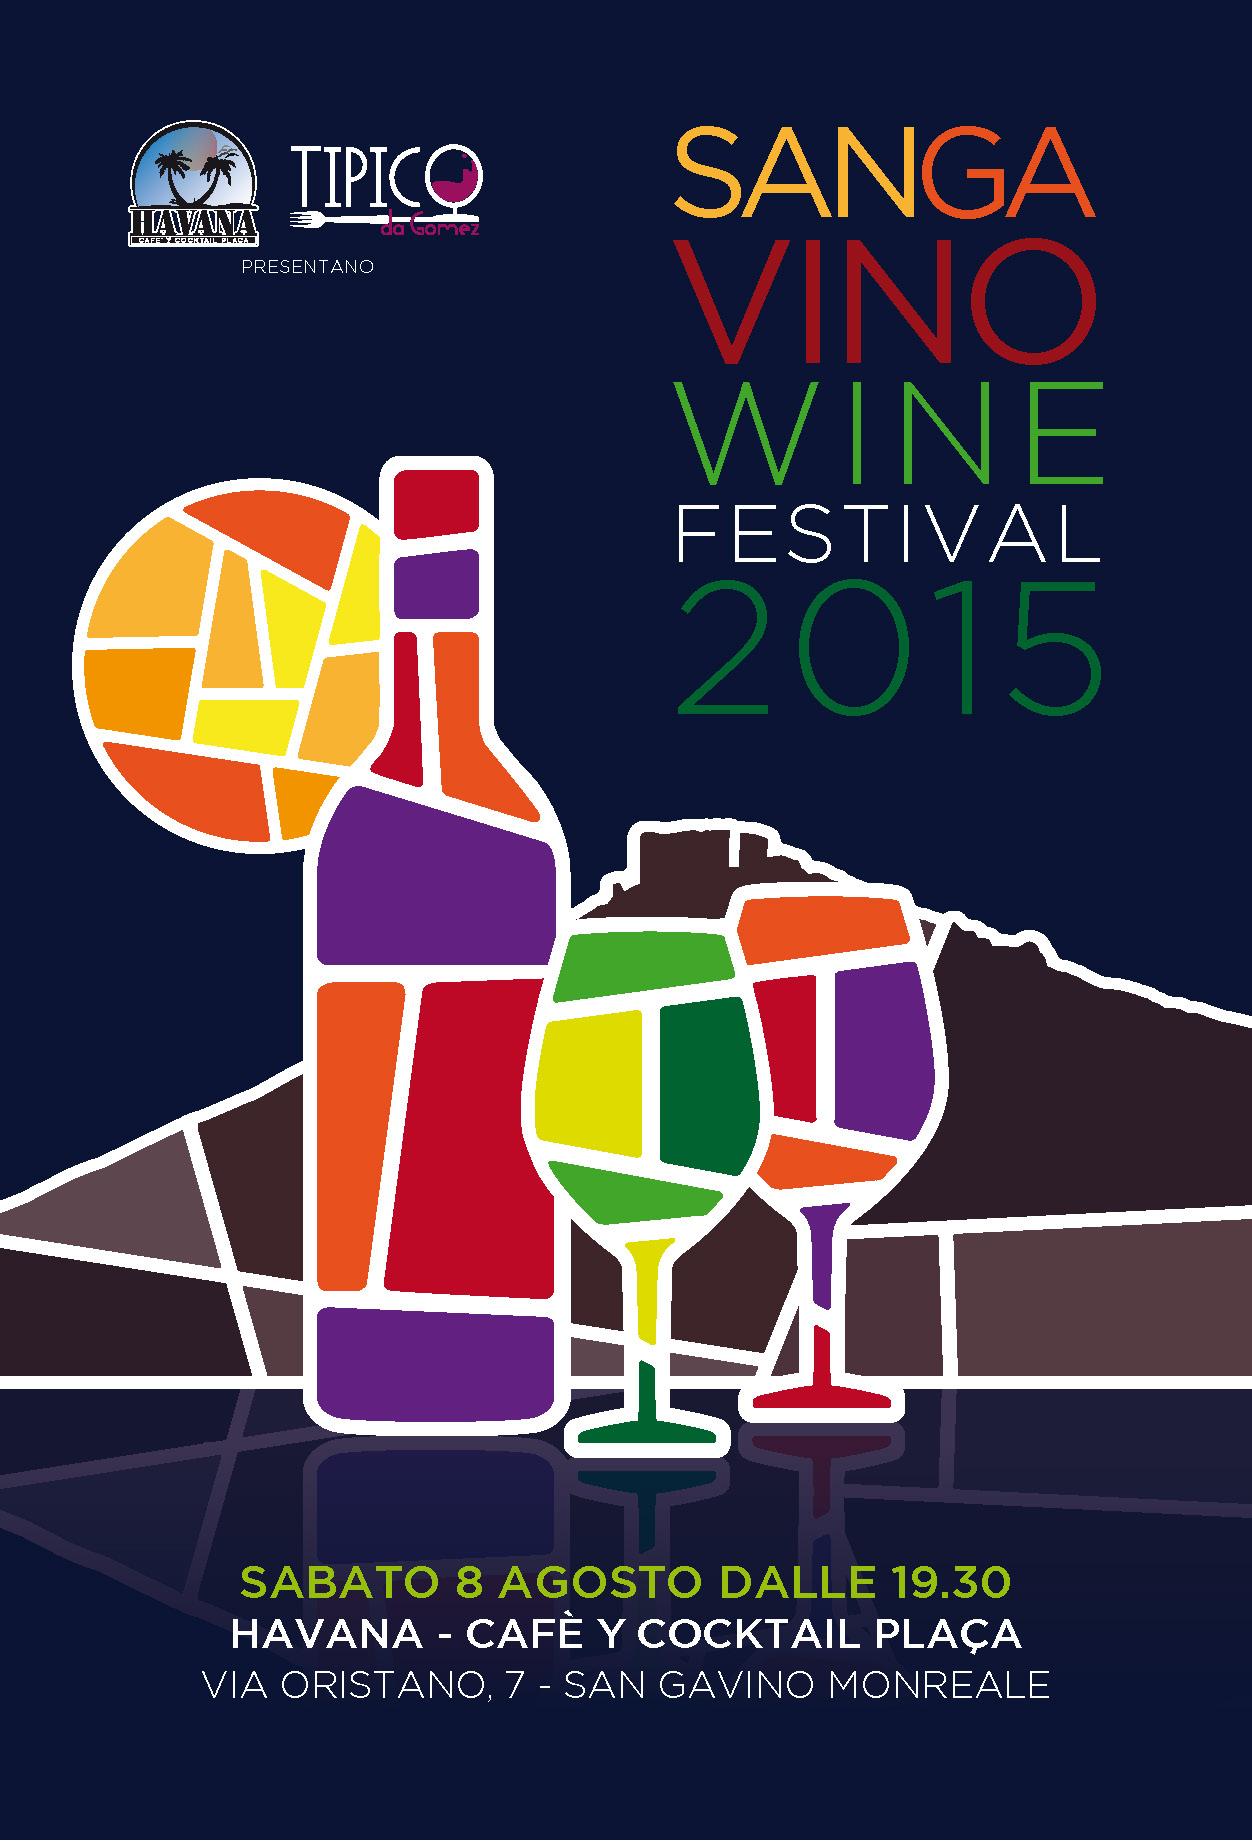 Sanga Vino Wine Festival 2015